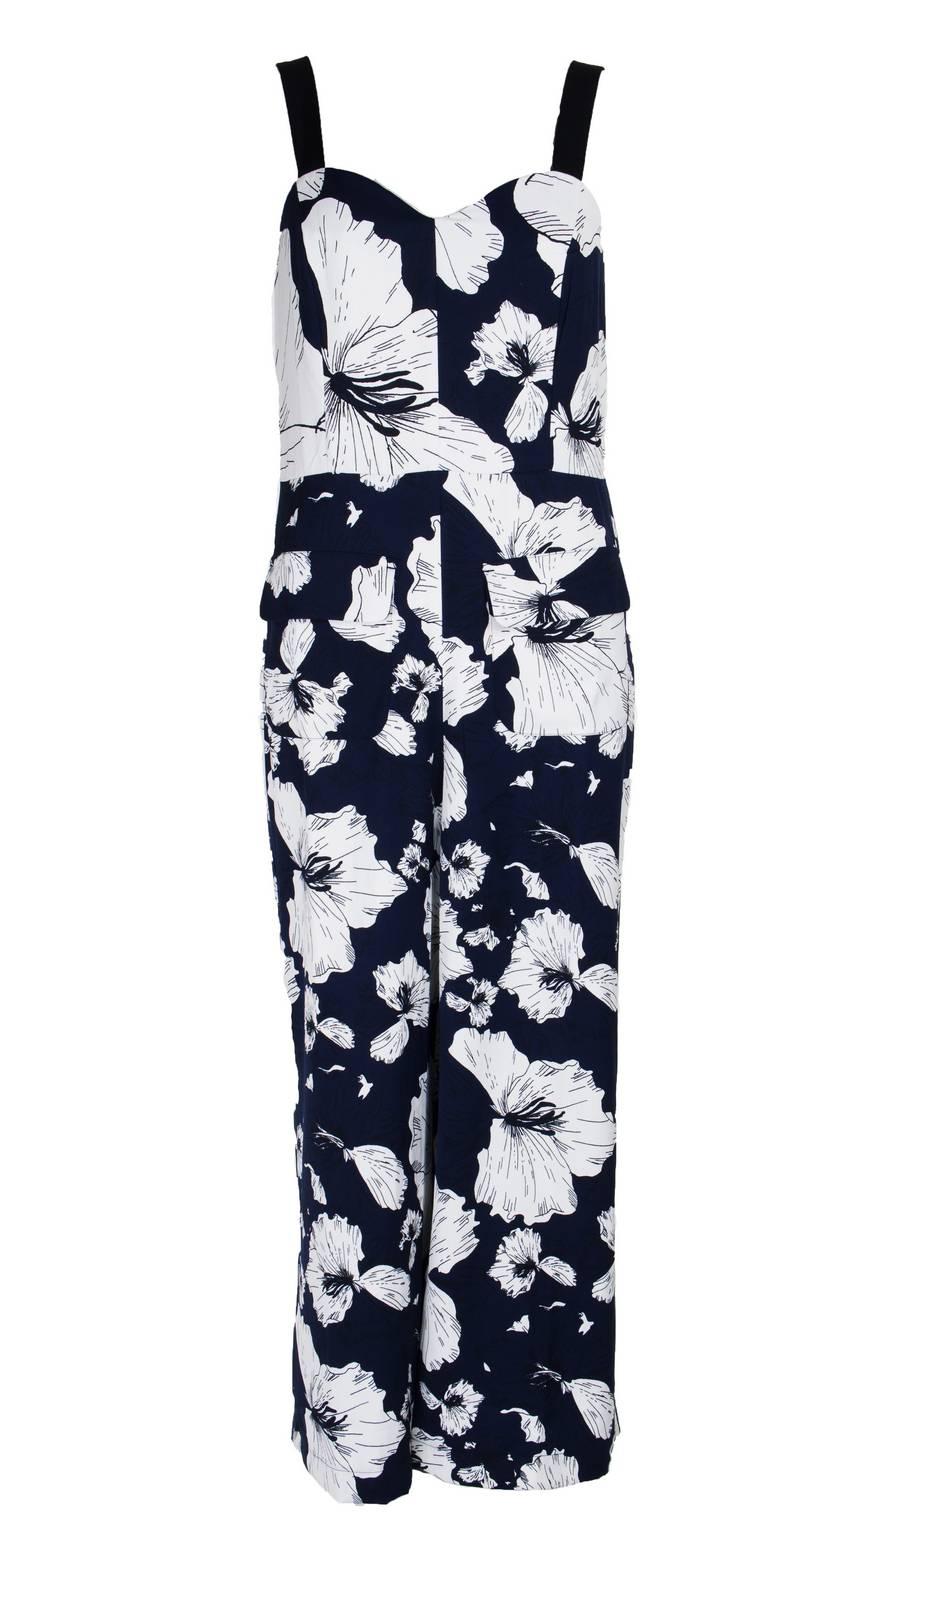 7be62ceff8d5 Jumpsuit Tropical Fauna Blue - Katie Kerr - Women s Clothing - UK